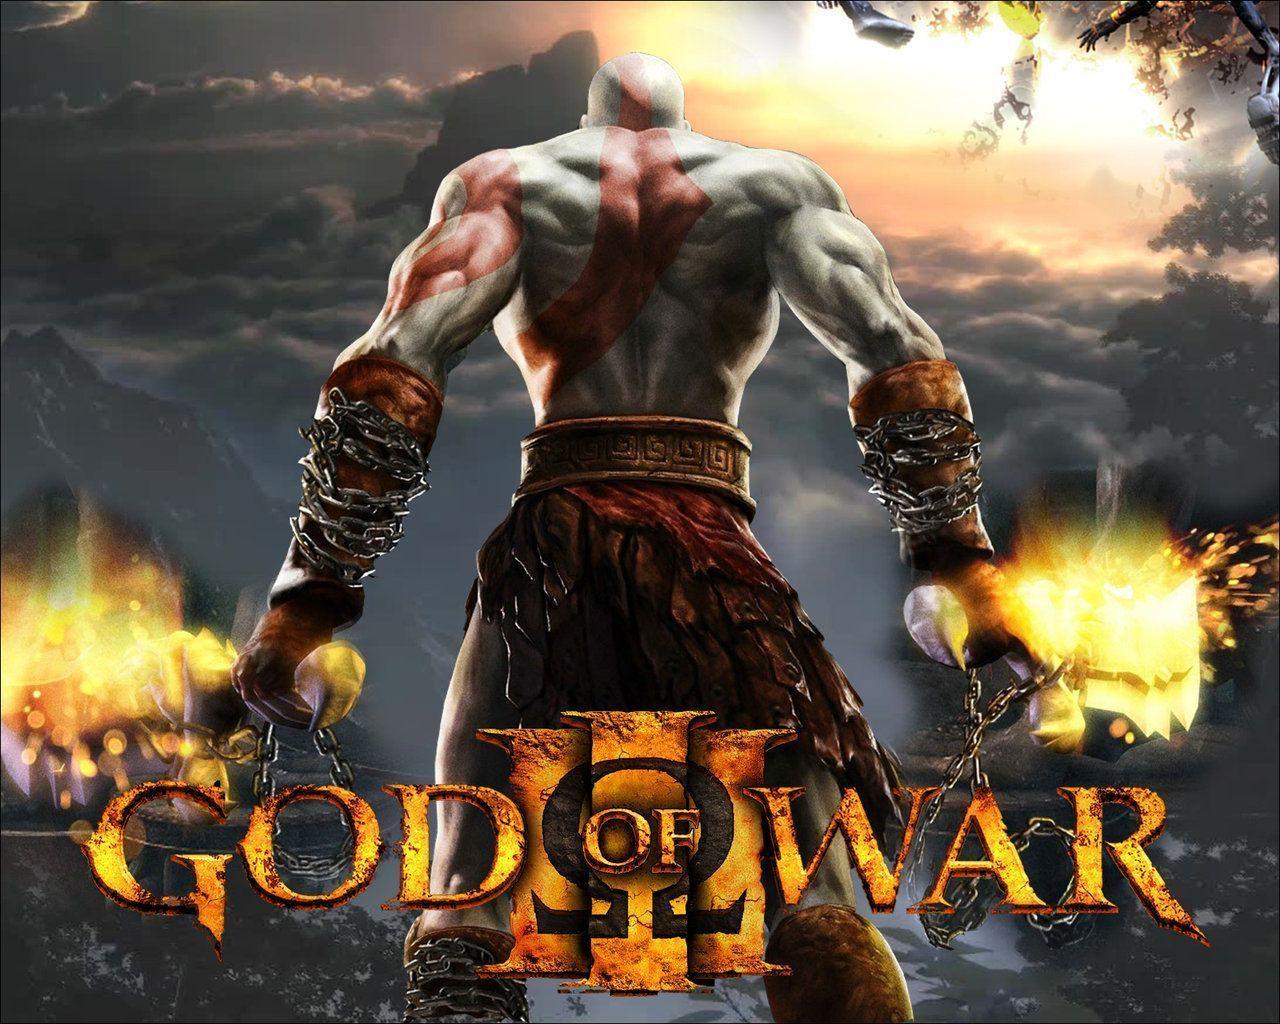 God Of War 3 Wallpapers - Wallpaper Cave